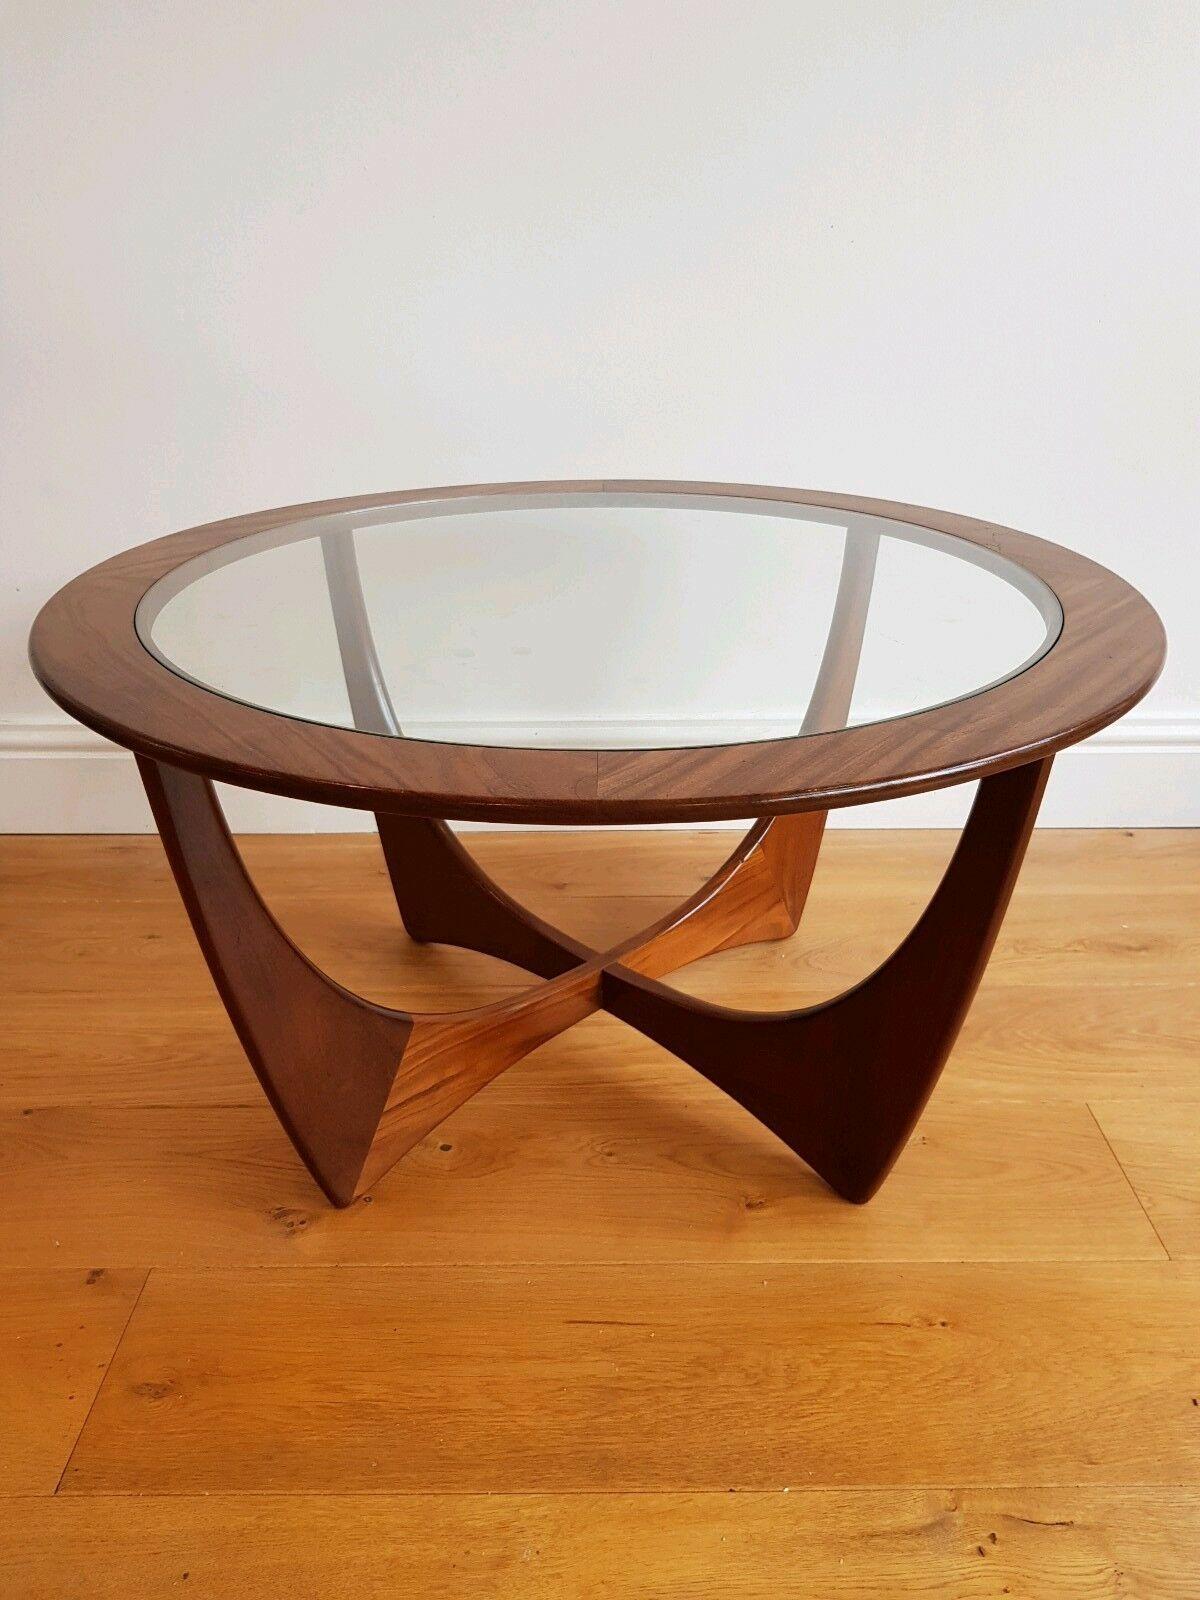 Vintage Retro Mid Century 1960s Danish Era Light Oak Astro Coffee Table 0 99 Retro Coffee Tables Coffee Table Wood Coffee Table [ 1600 x 1200 Pixel ]